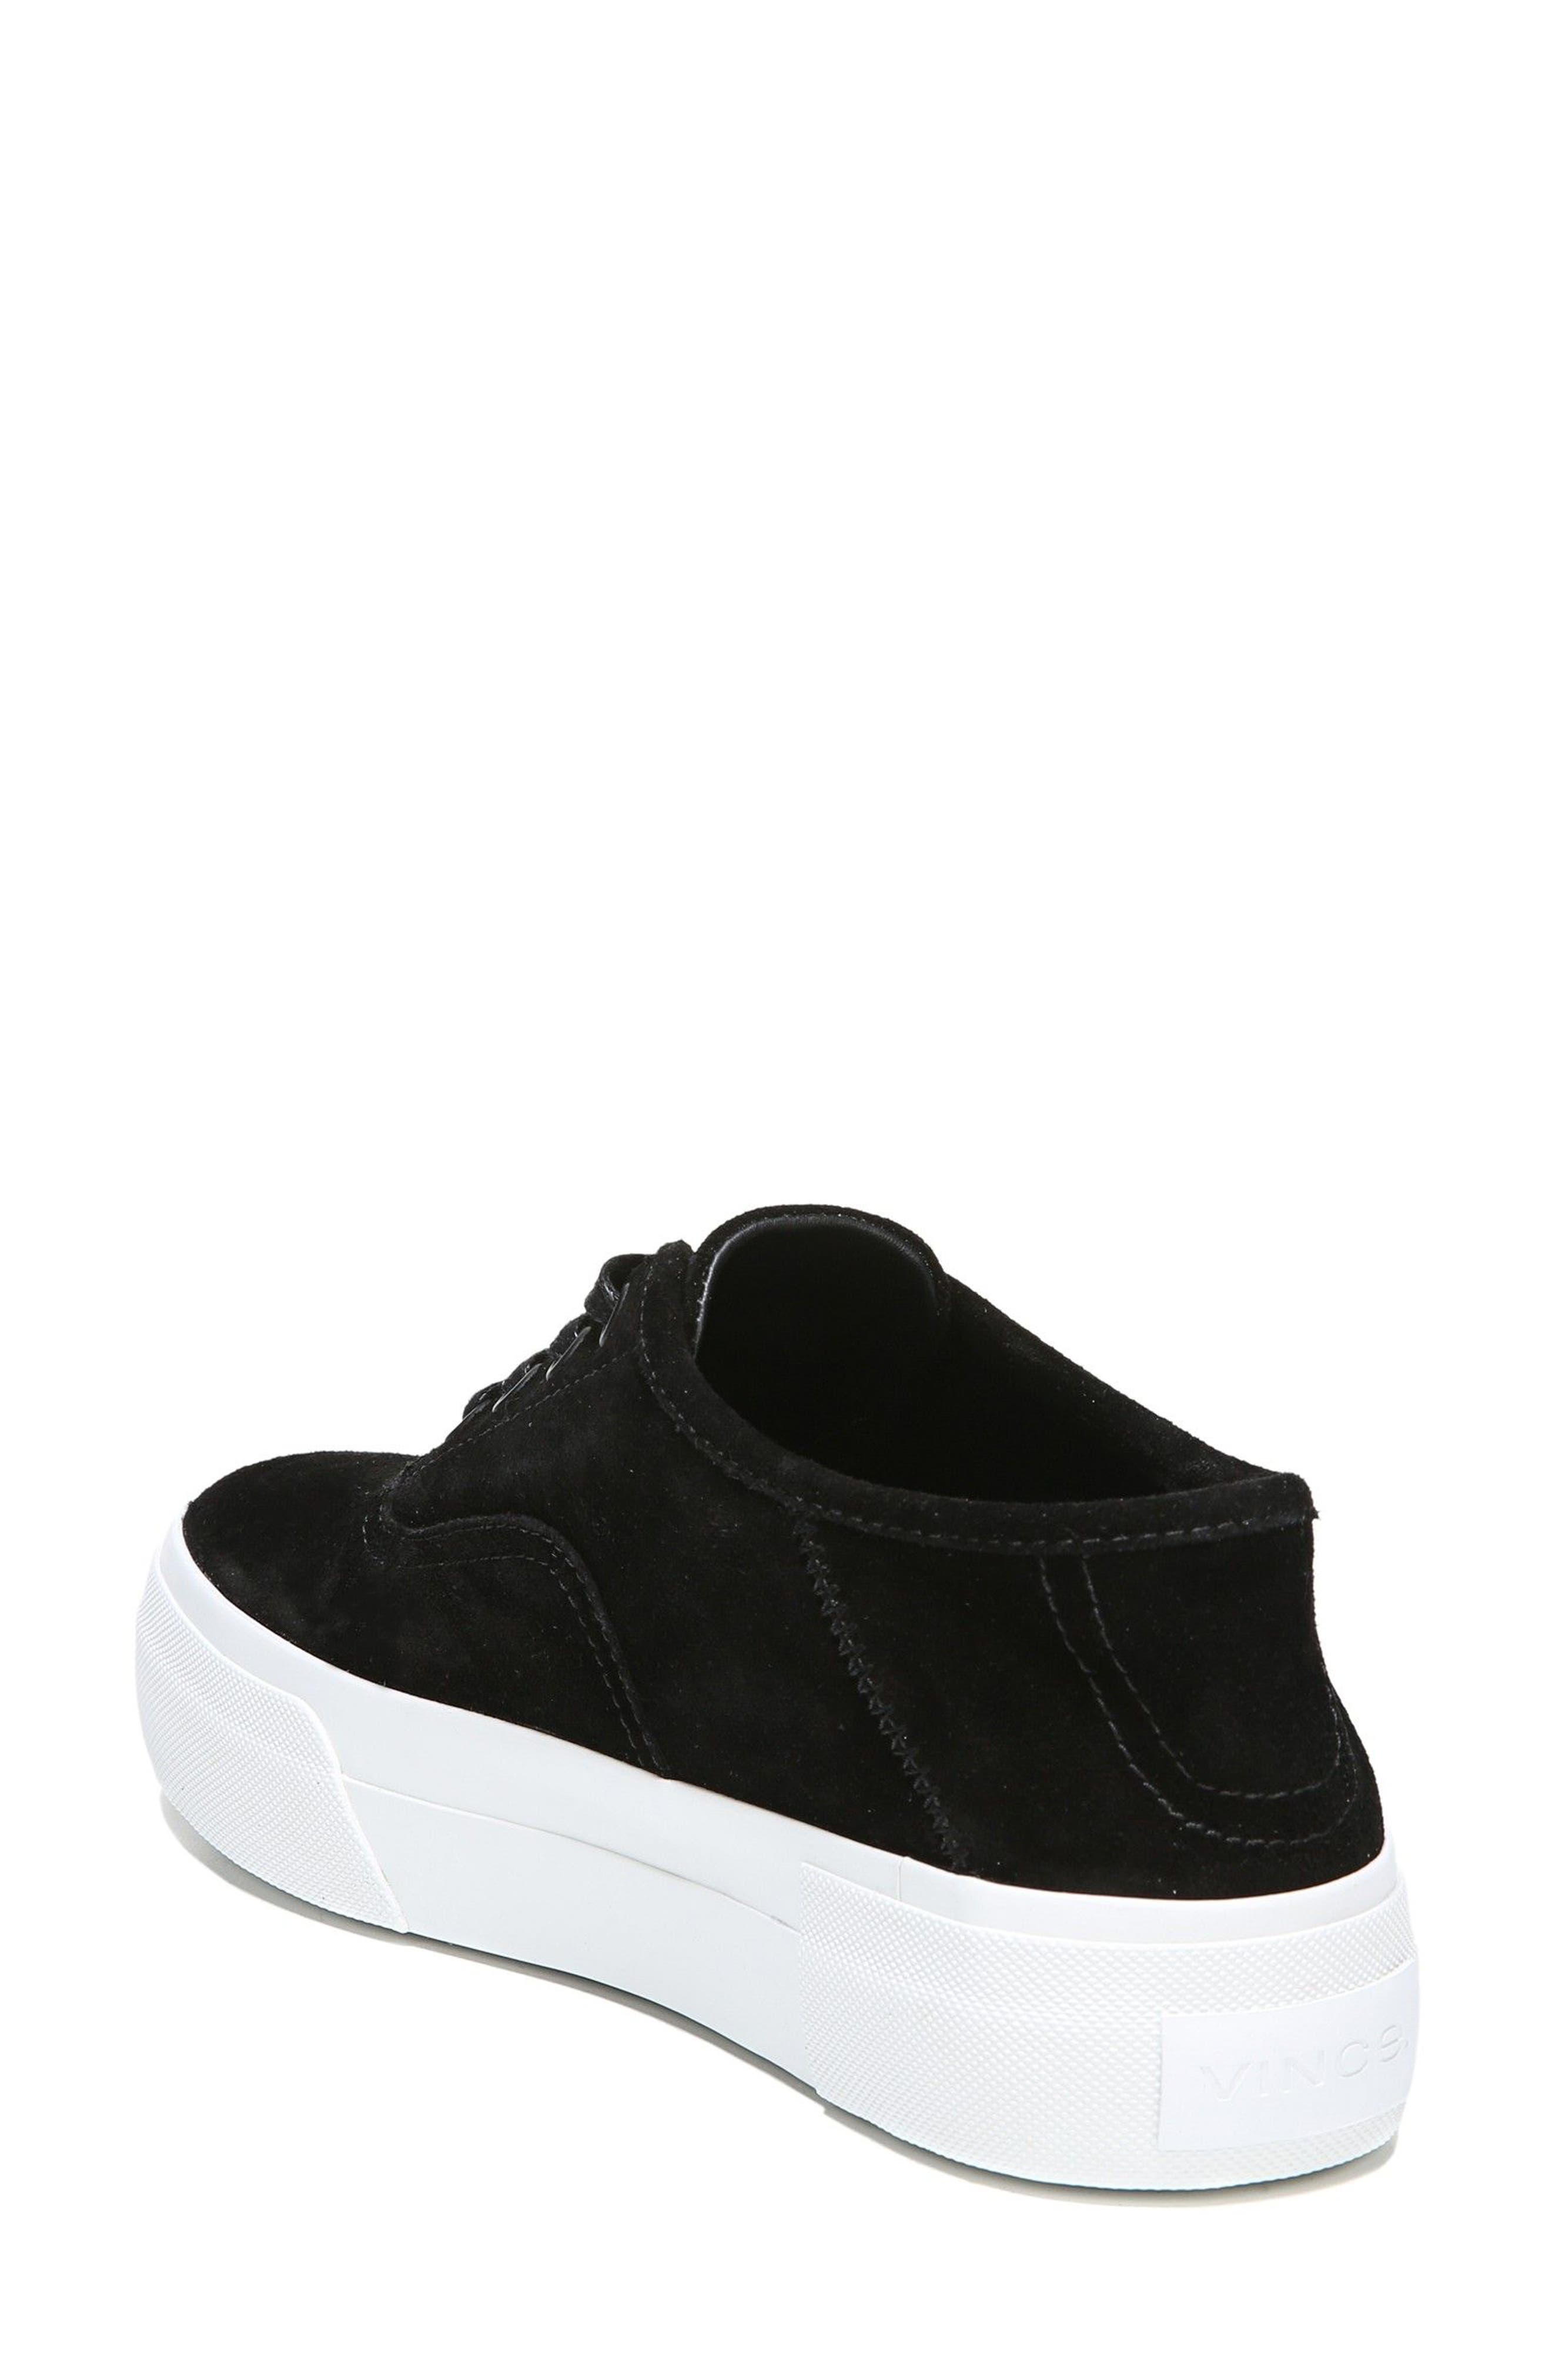 Copley Platform Sneaker,                             Alternate thumbnail 2, color,                             001